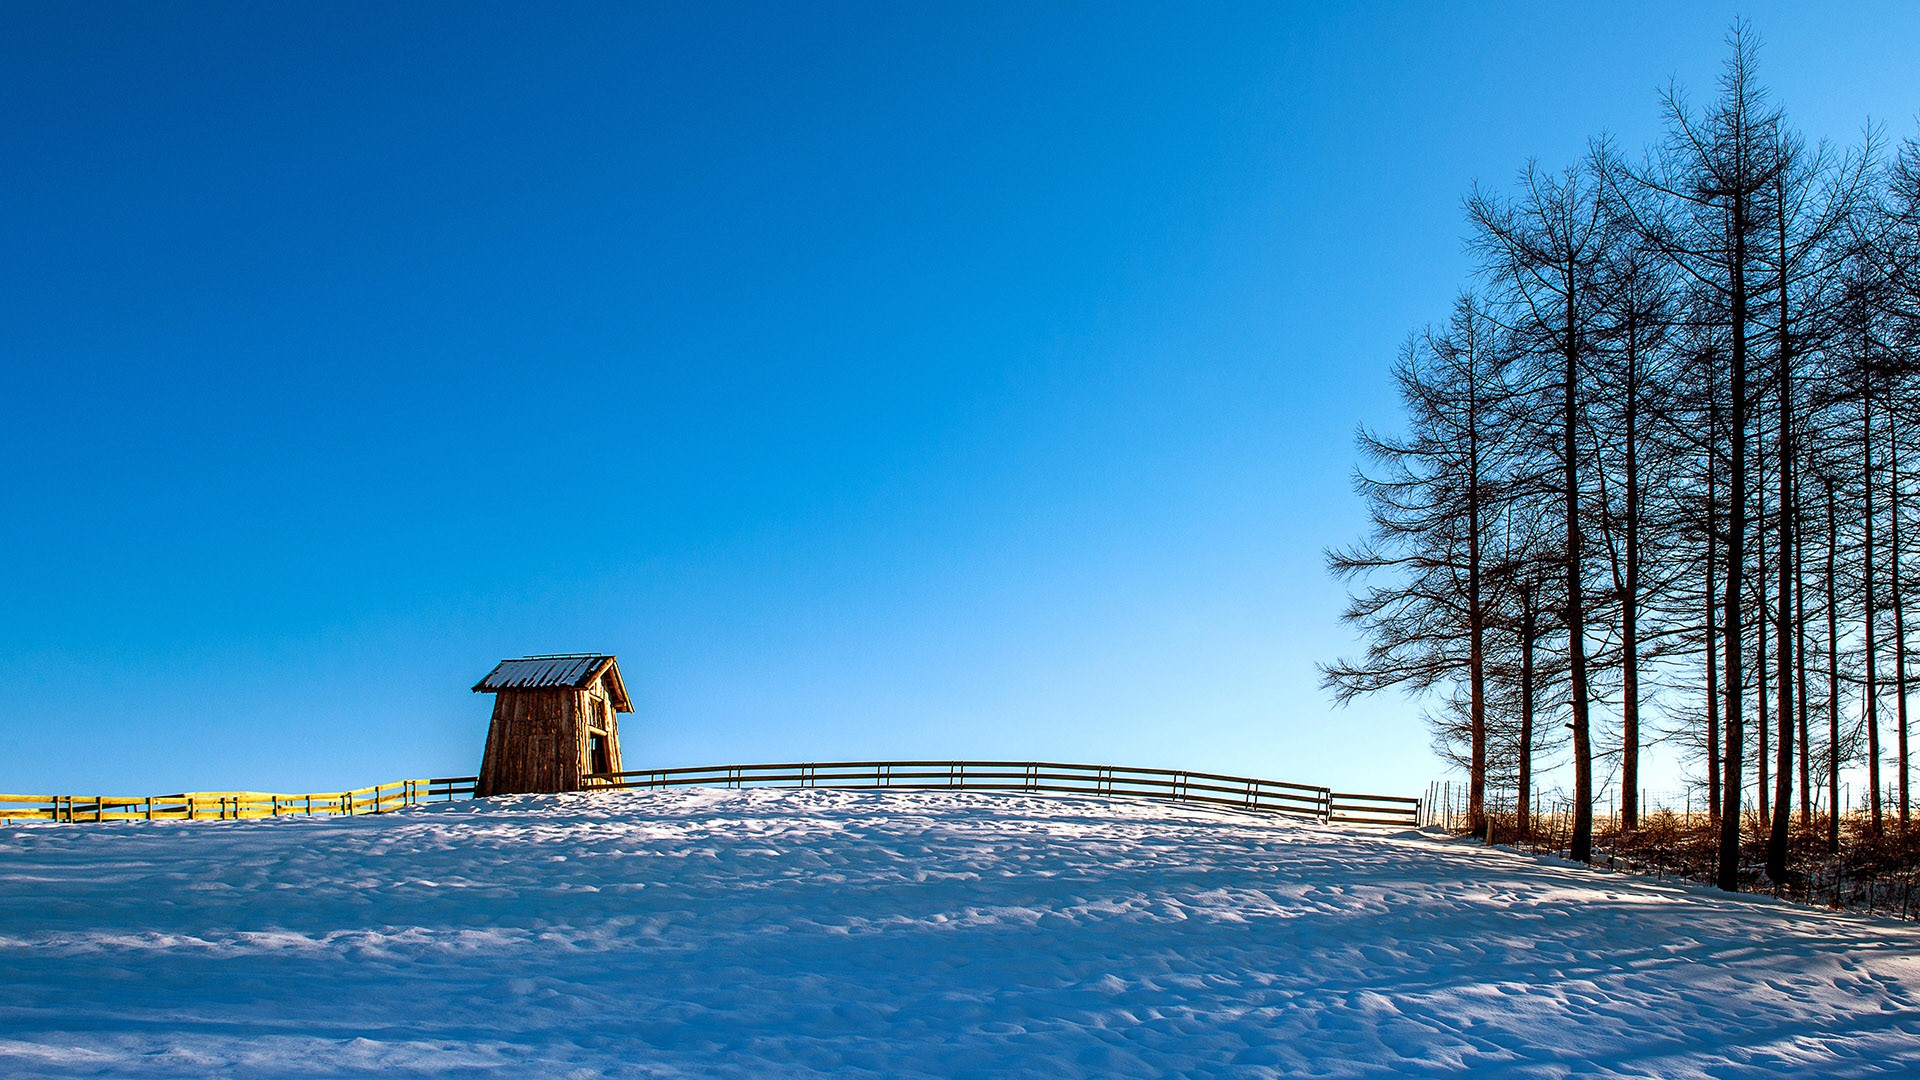 Wooden cottage in winter, Daegwallyeong Sheep Farm in Gangwondo